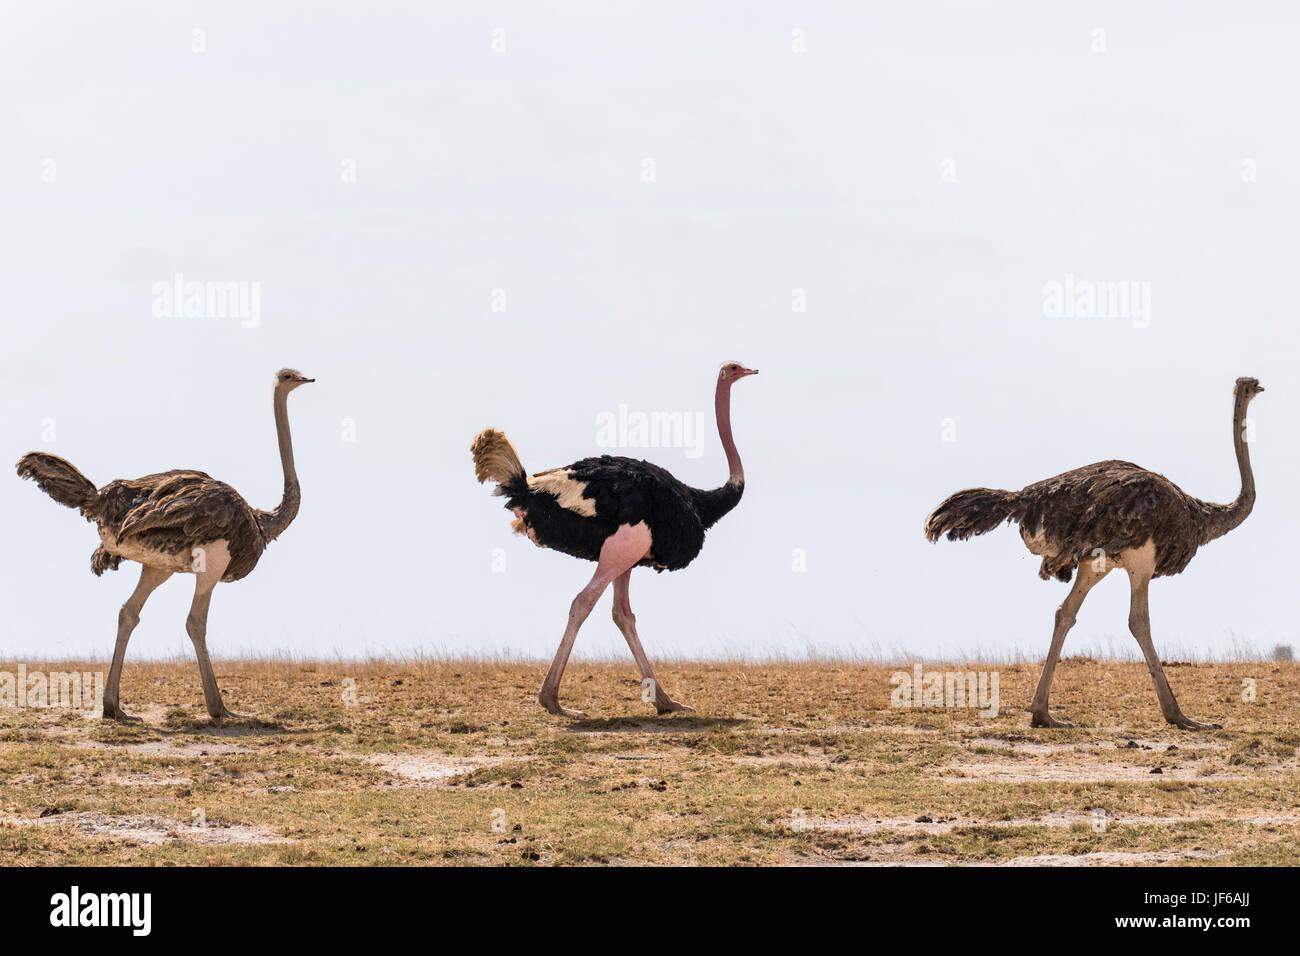 Ostriches in Kitirua Conservancy, near Amboseli Park, Kenya. - Stock Image